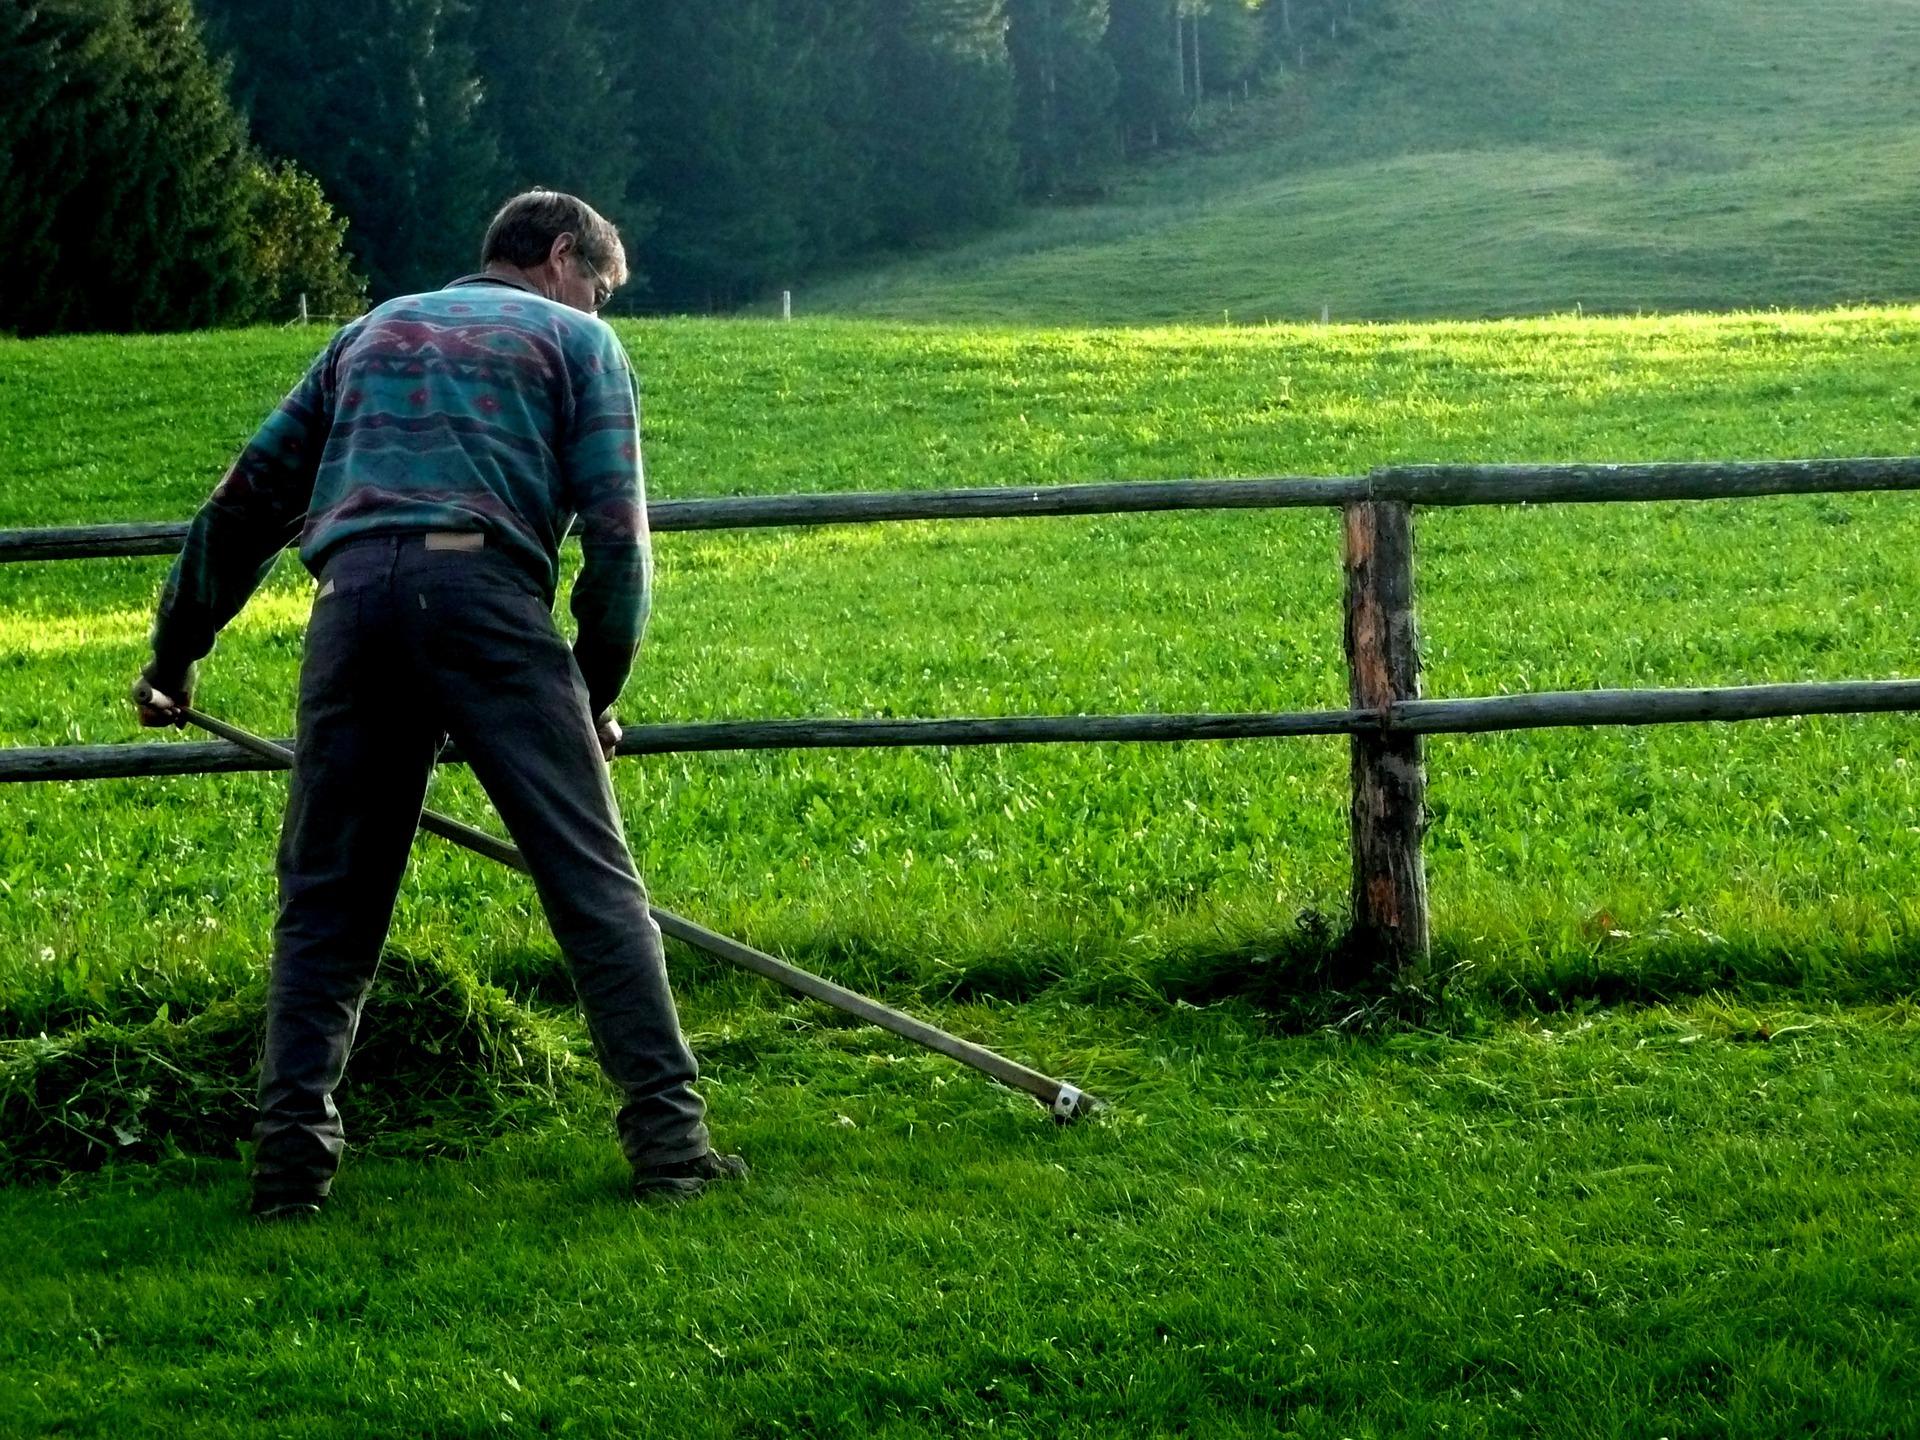 scythe grass cutting